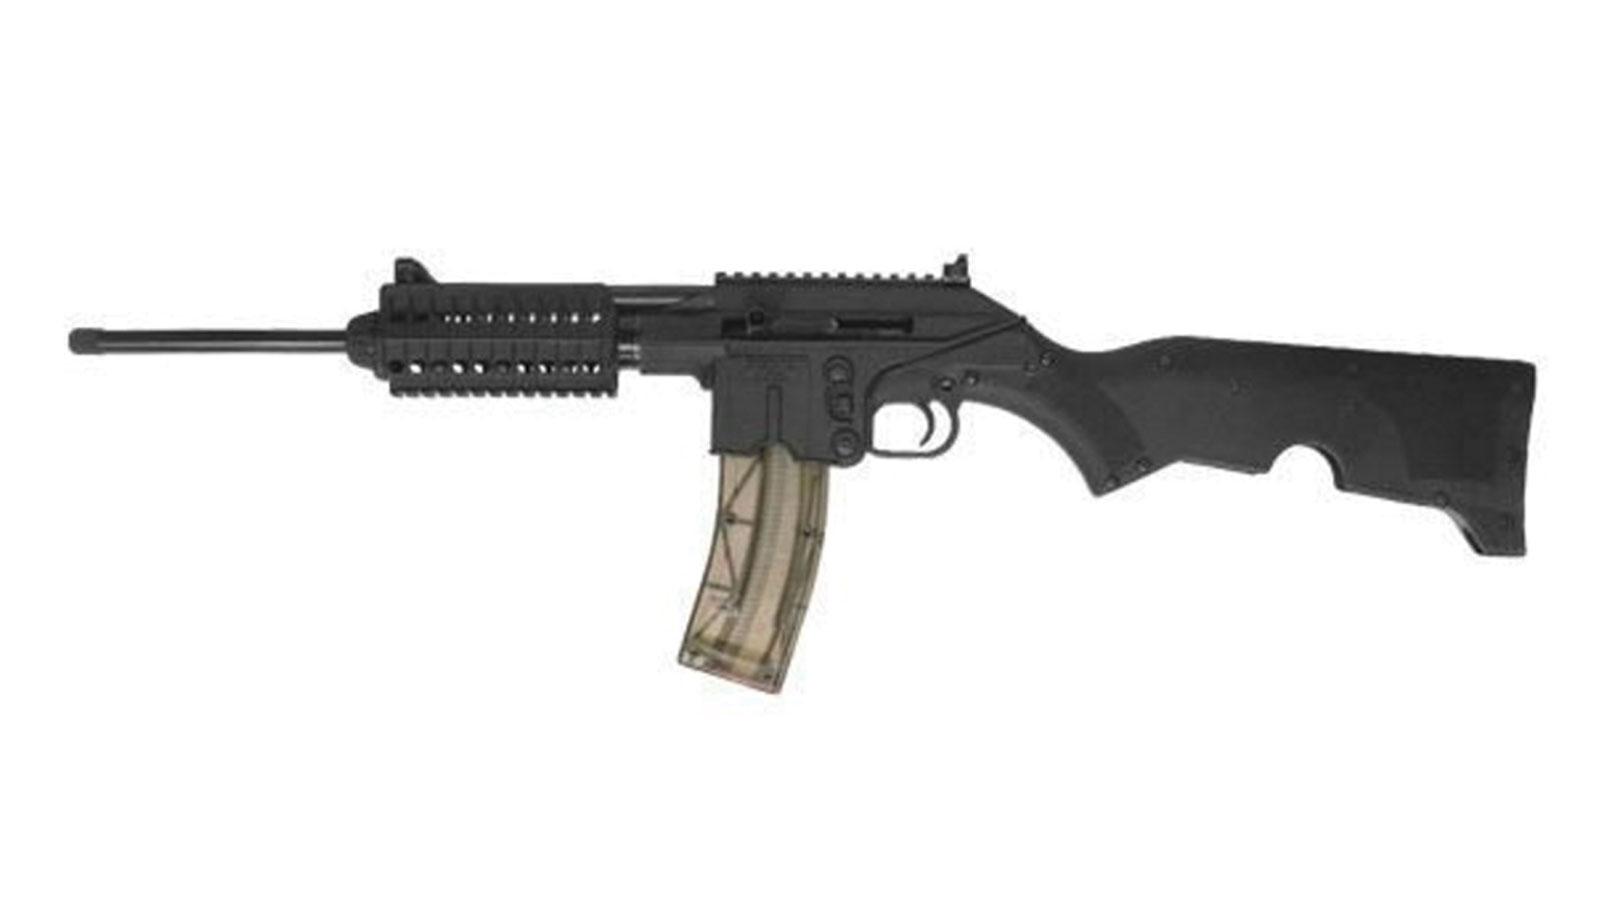 Kel-Tec SU22E SU22 Rifle SA 22 Long Rifle 16.1 26+1 Collapsible Stk Black in.